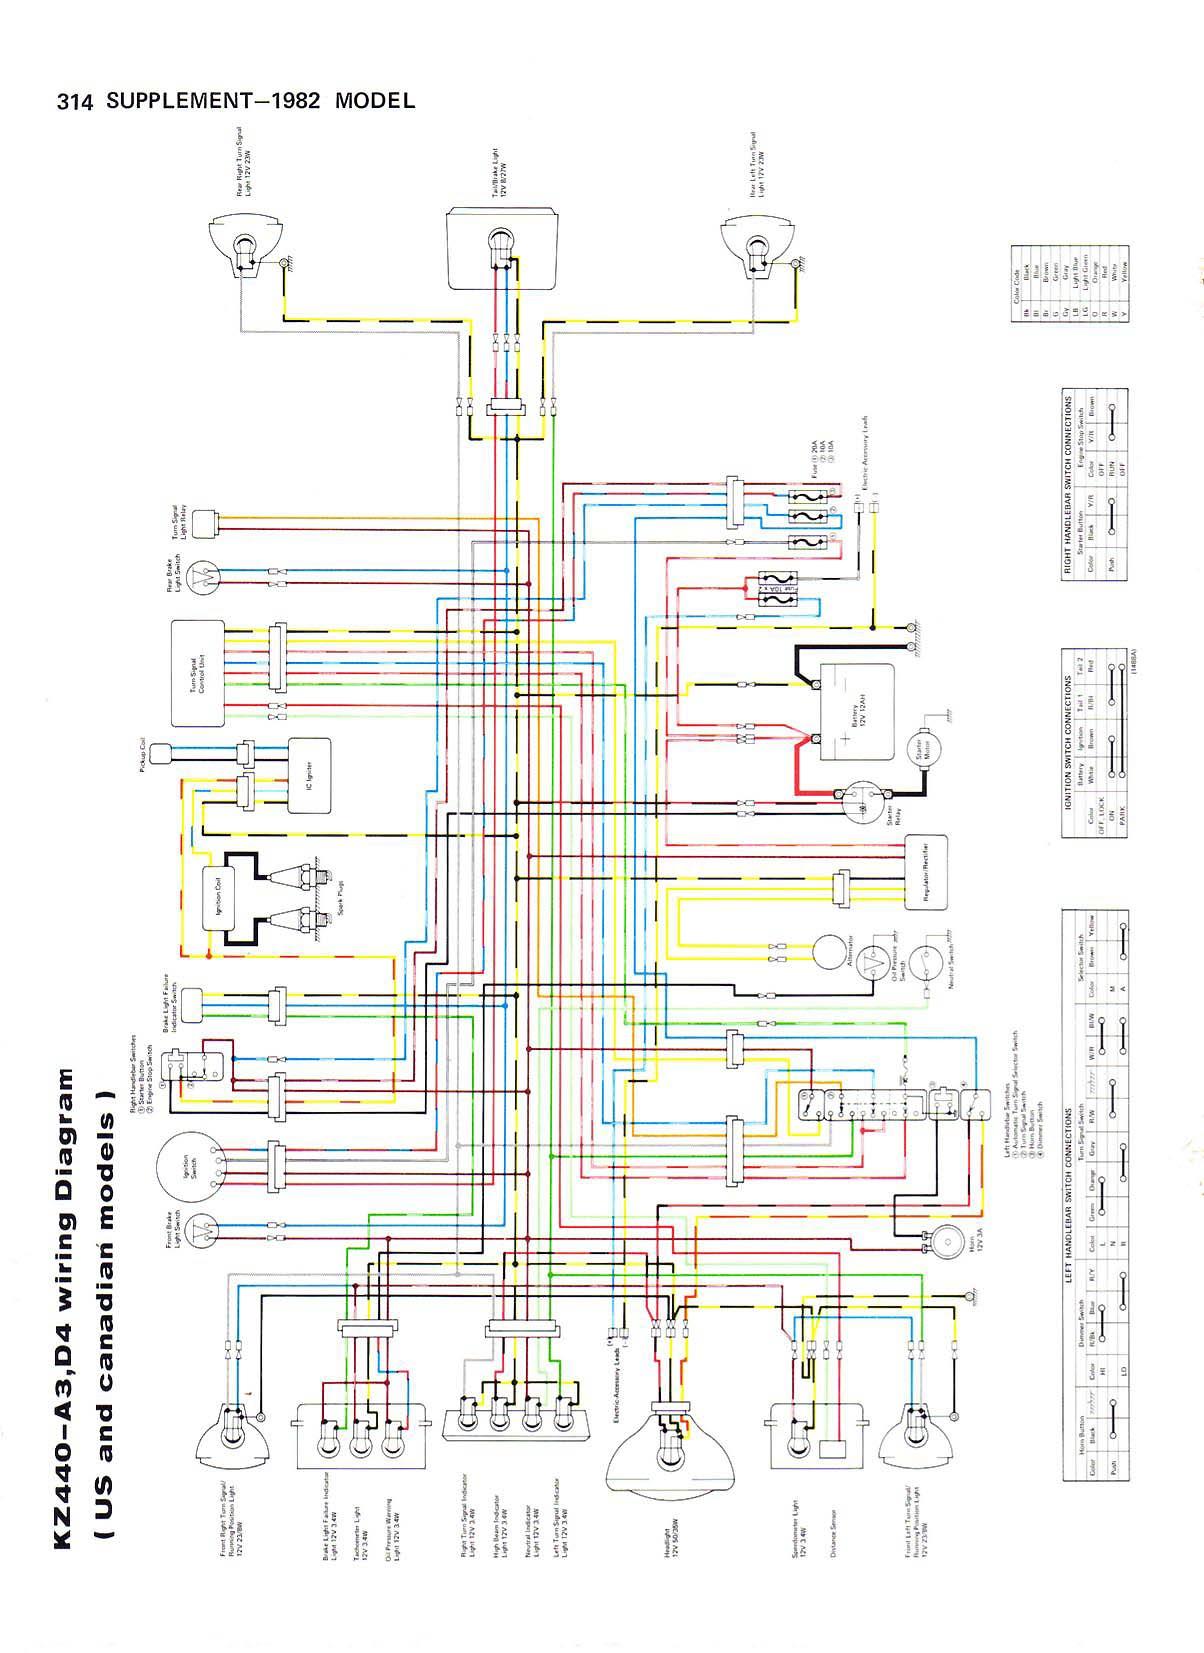 Cafe Bike Wiring Diagram - Wiring Diagrams Racing Motorcycle Wiring Diagram on